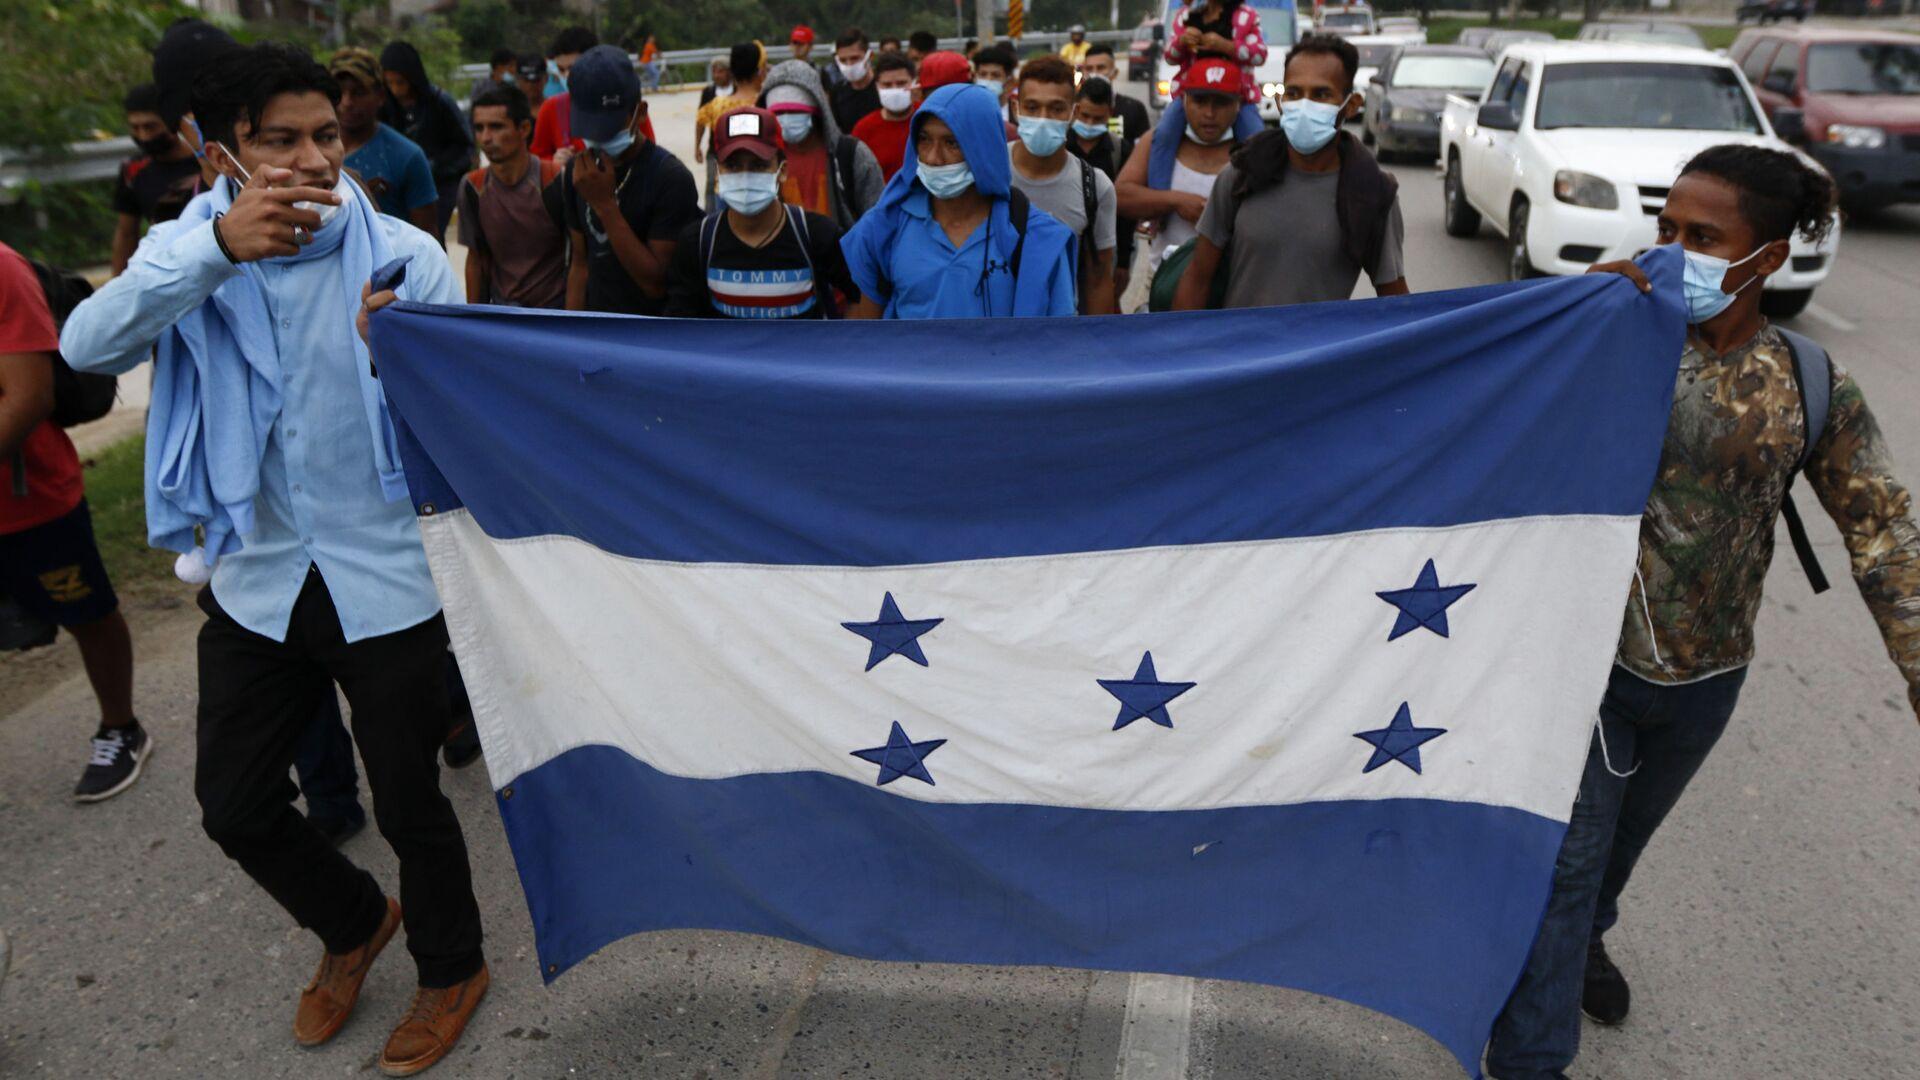 Caravana de migrantes hondureños  - Sputnik Mundo, 1920, 15.04.2021